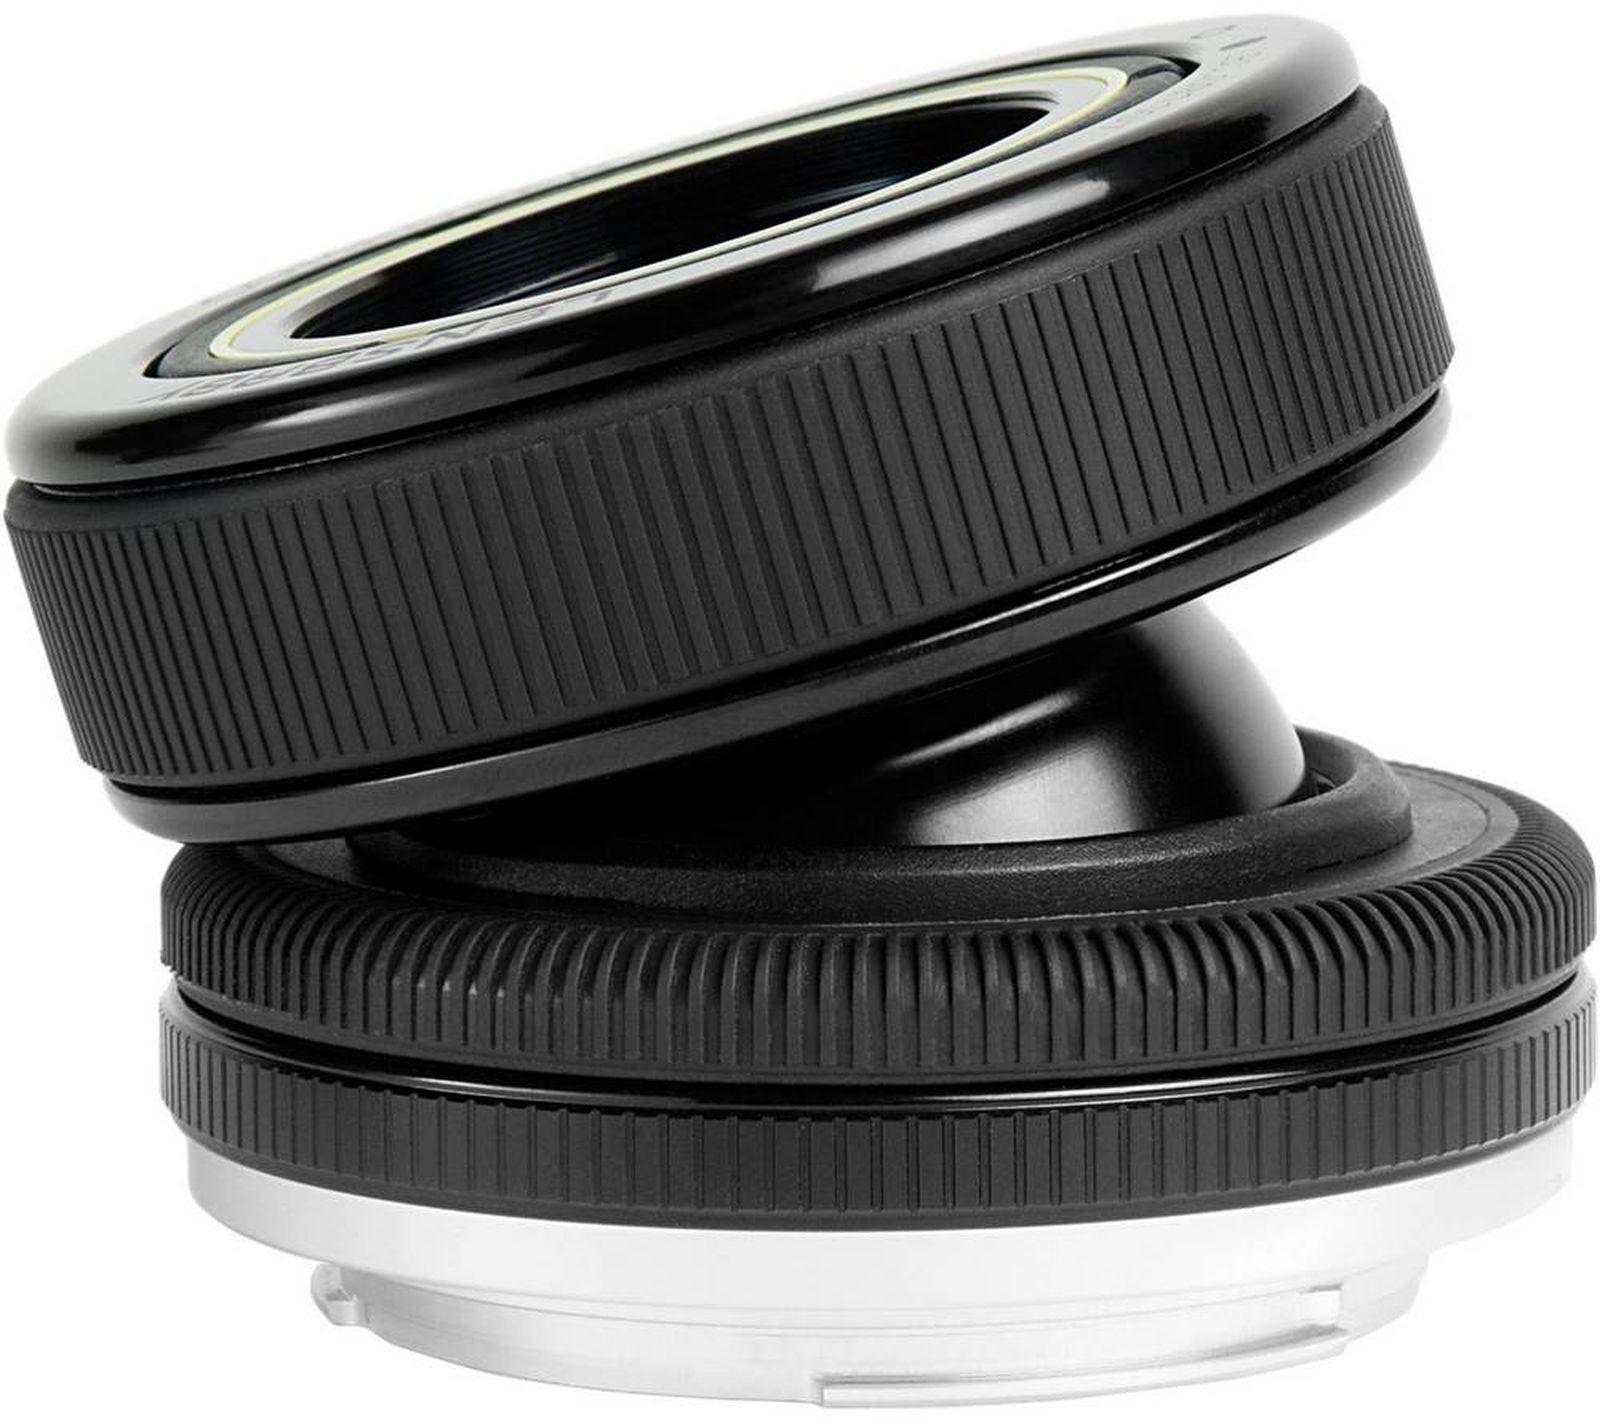 Объектив Lensbaby Composer Pro Double Glass 50mm f/4.0 для Samsung NX, черный